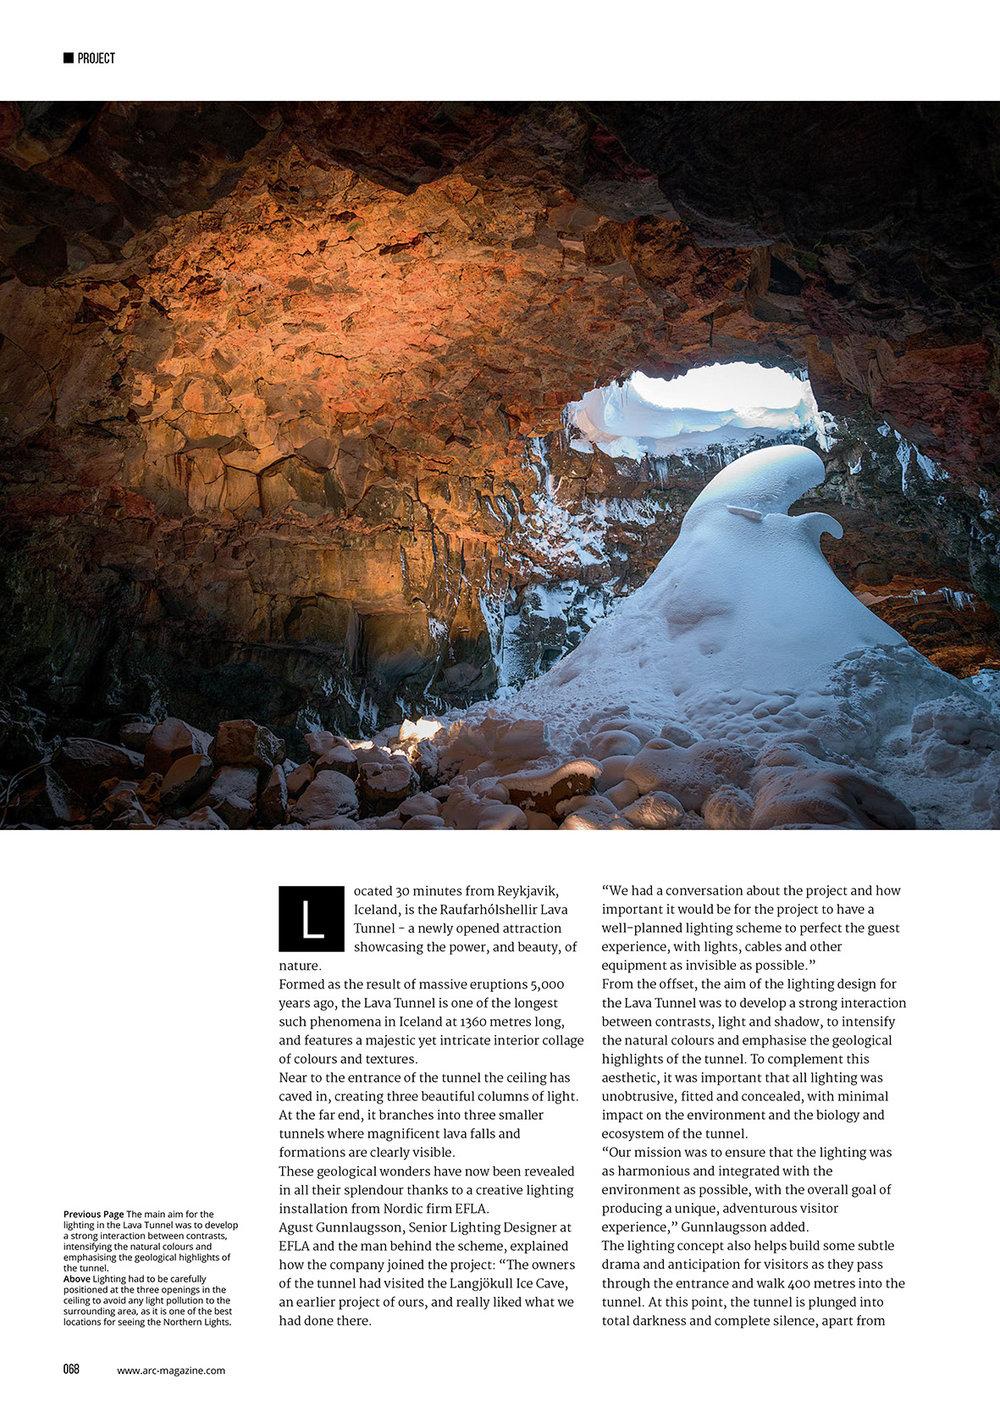 arc magazine_107_Lava Tunnel article_pp66-74 3w.jpg